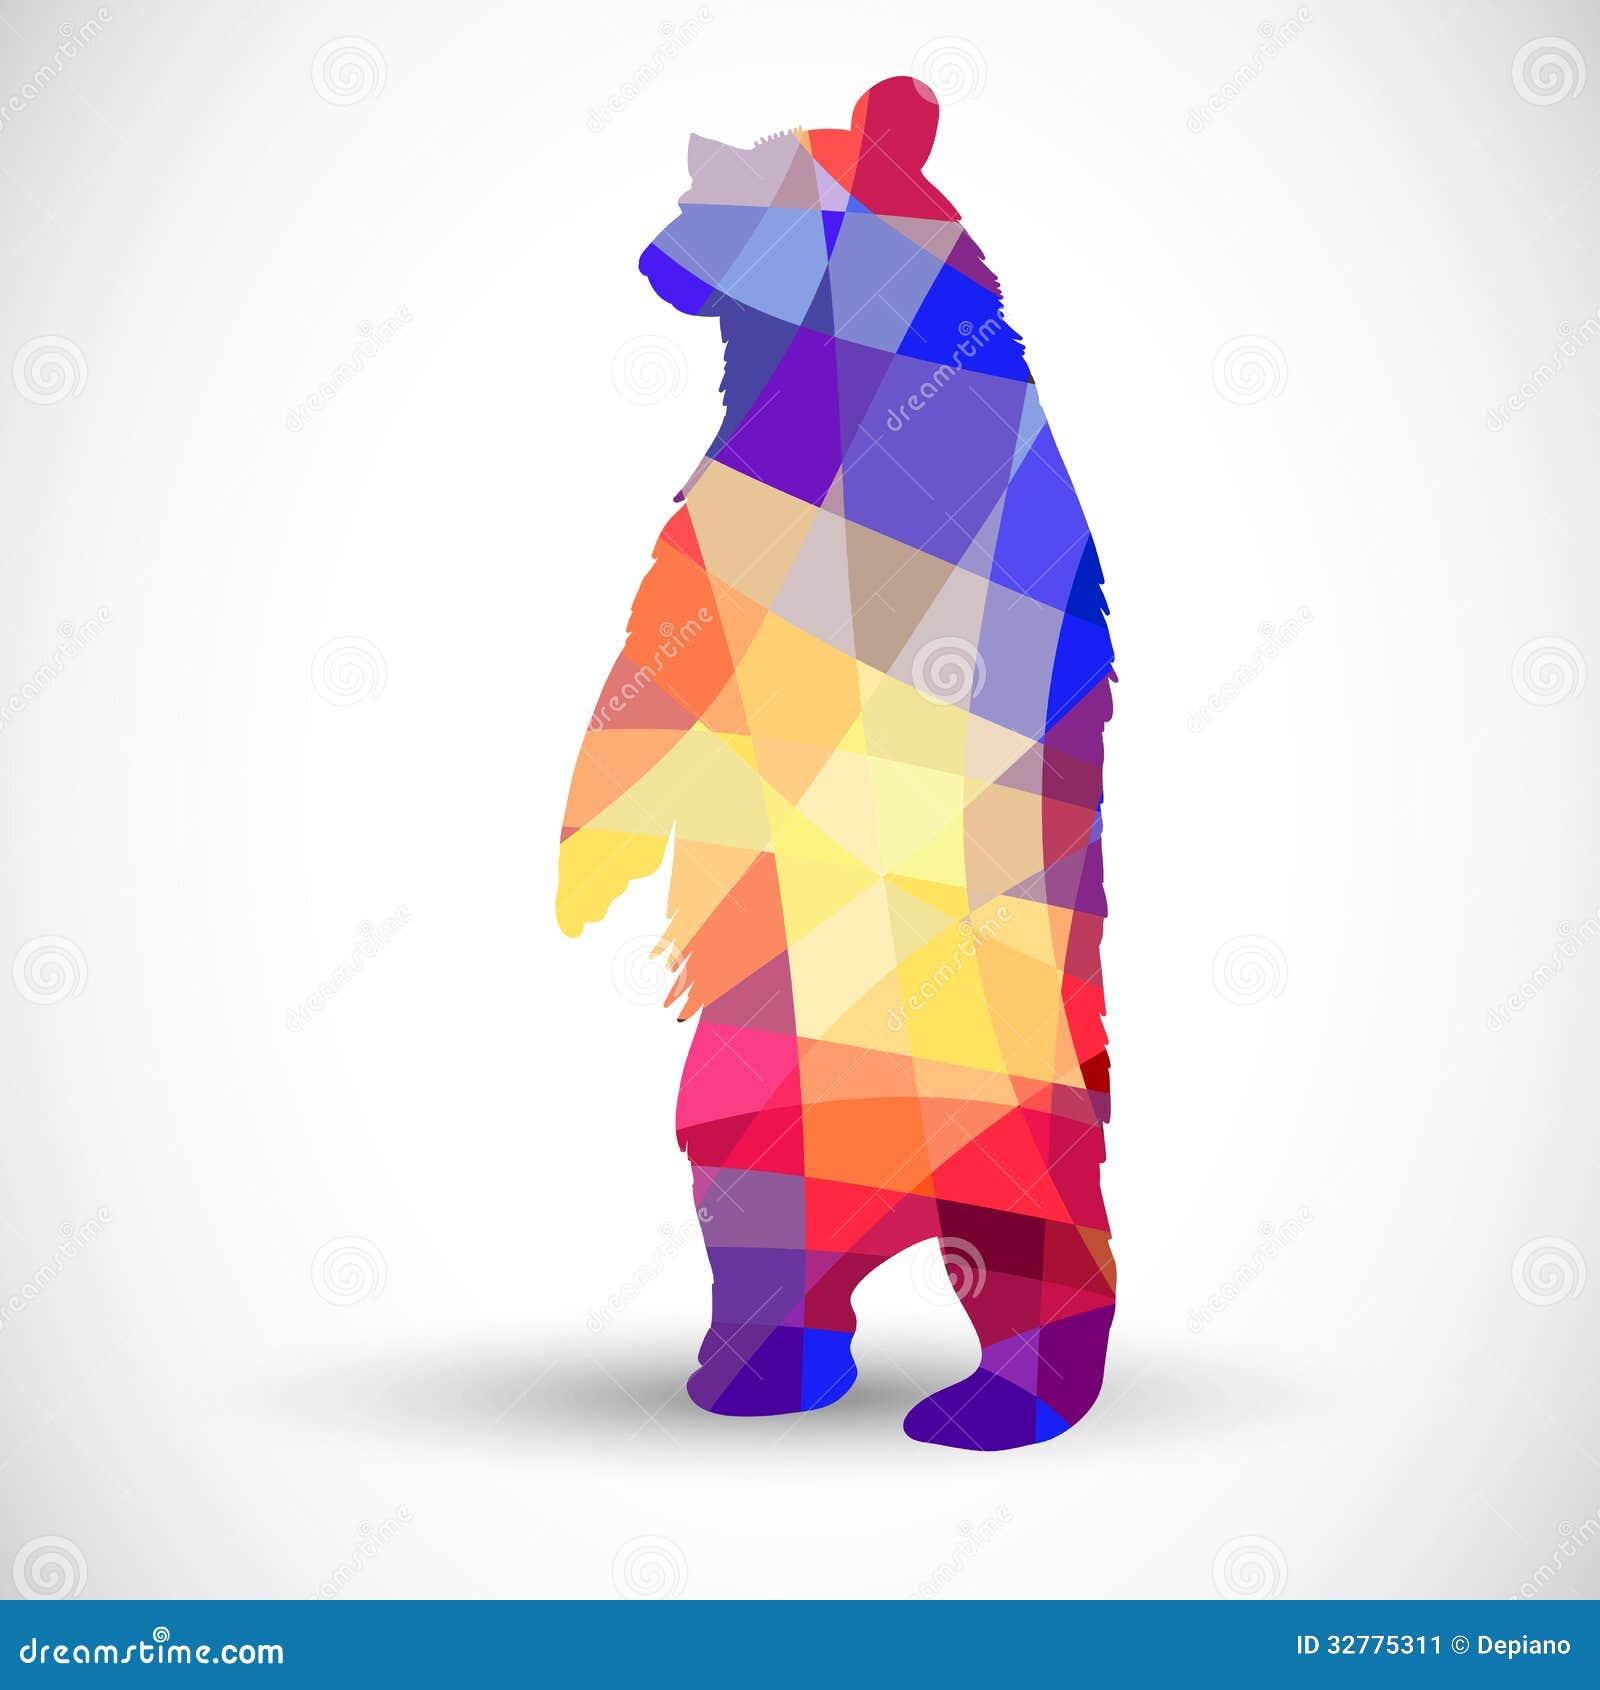 Geometric Bear Drawing Silhouette a bear of geometricGeometric Bear Drawing